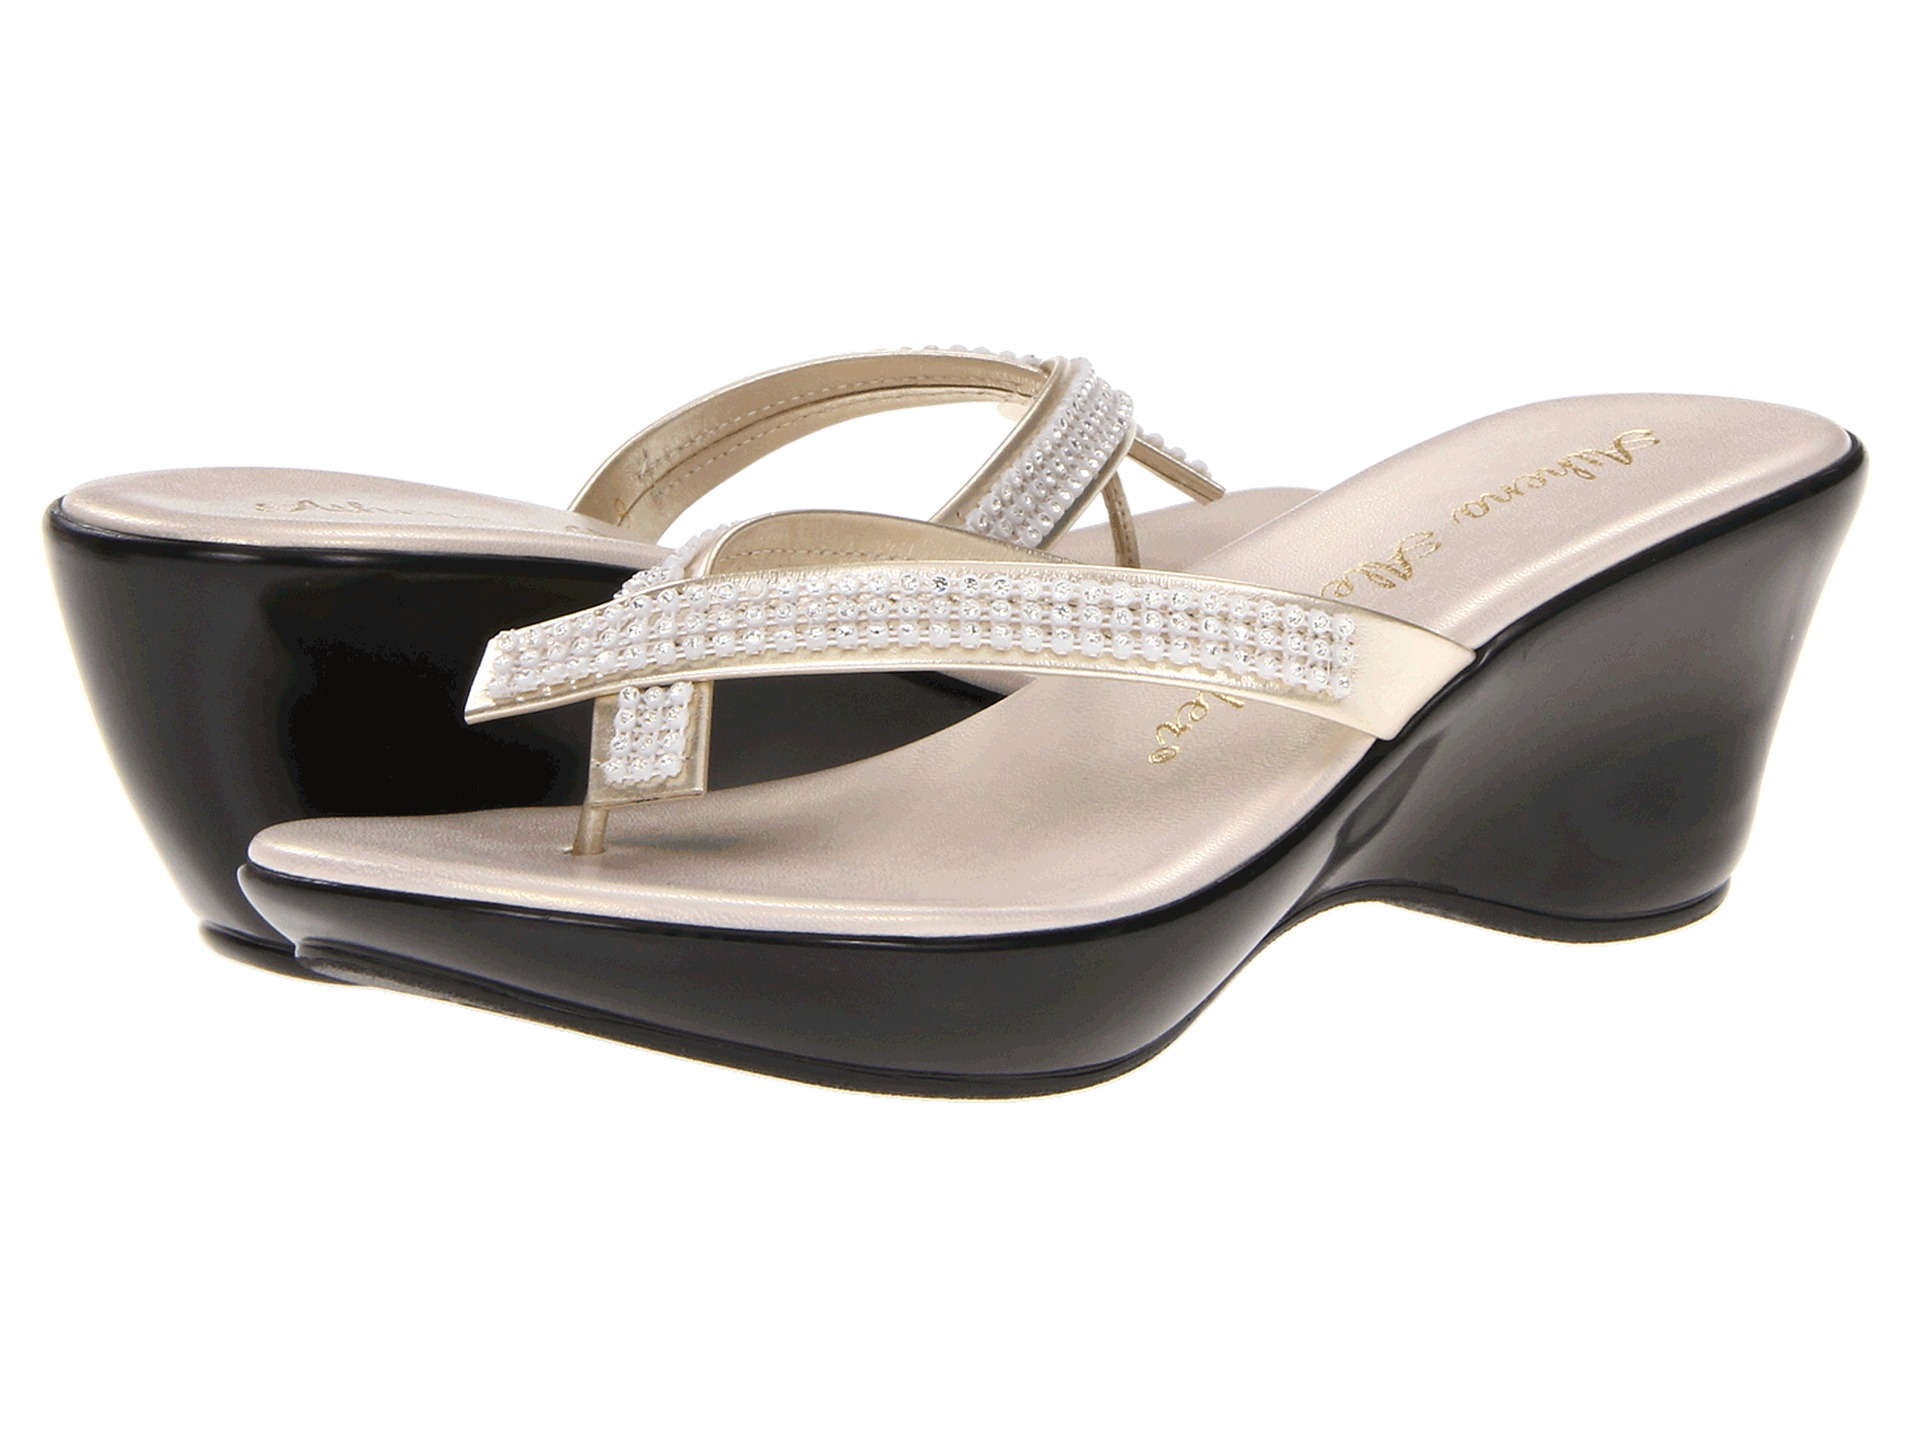 Athena Alexander Shoes Size